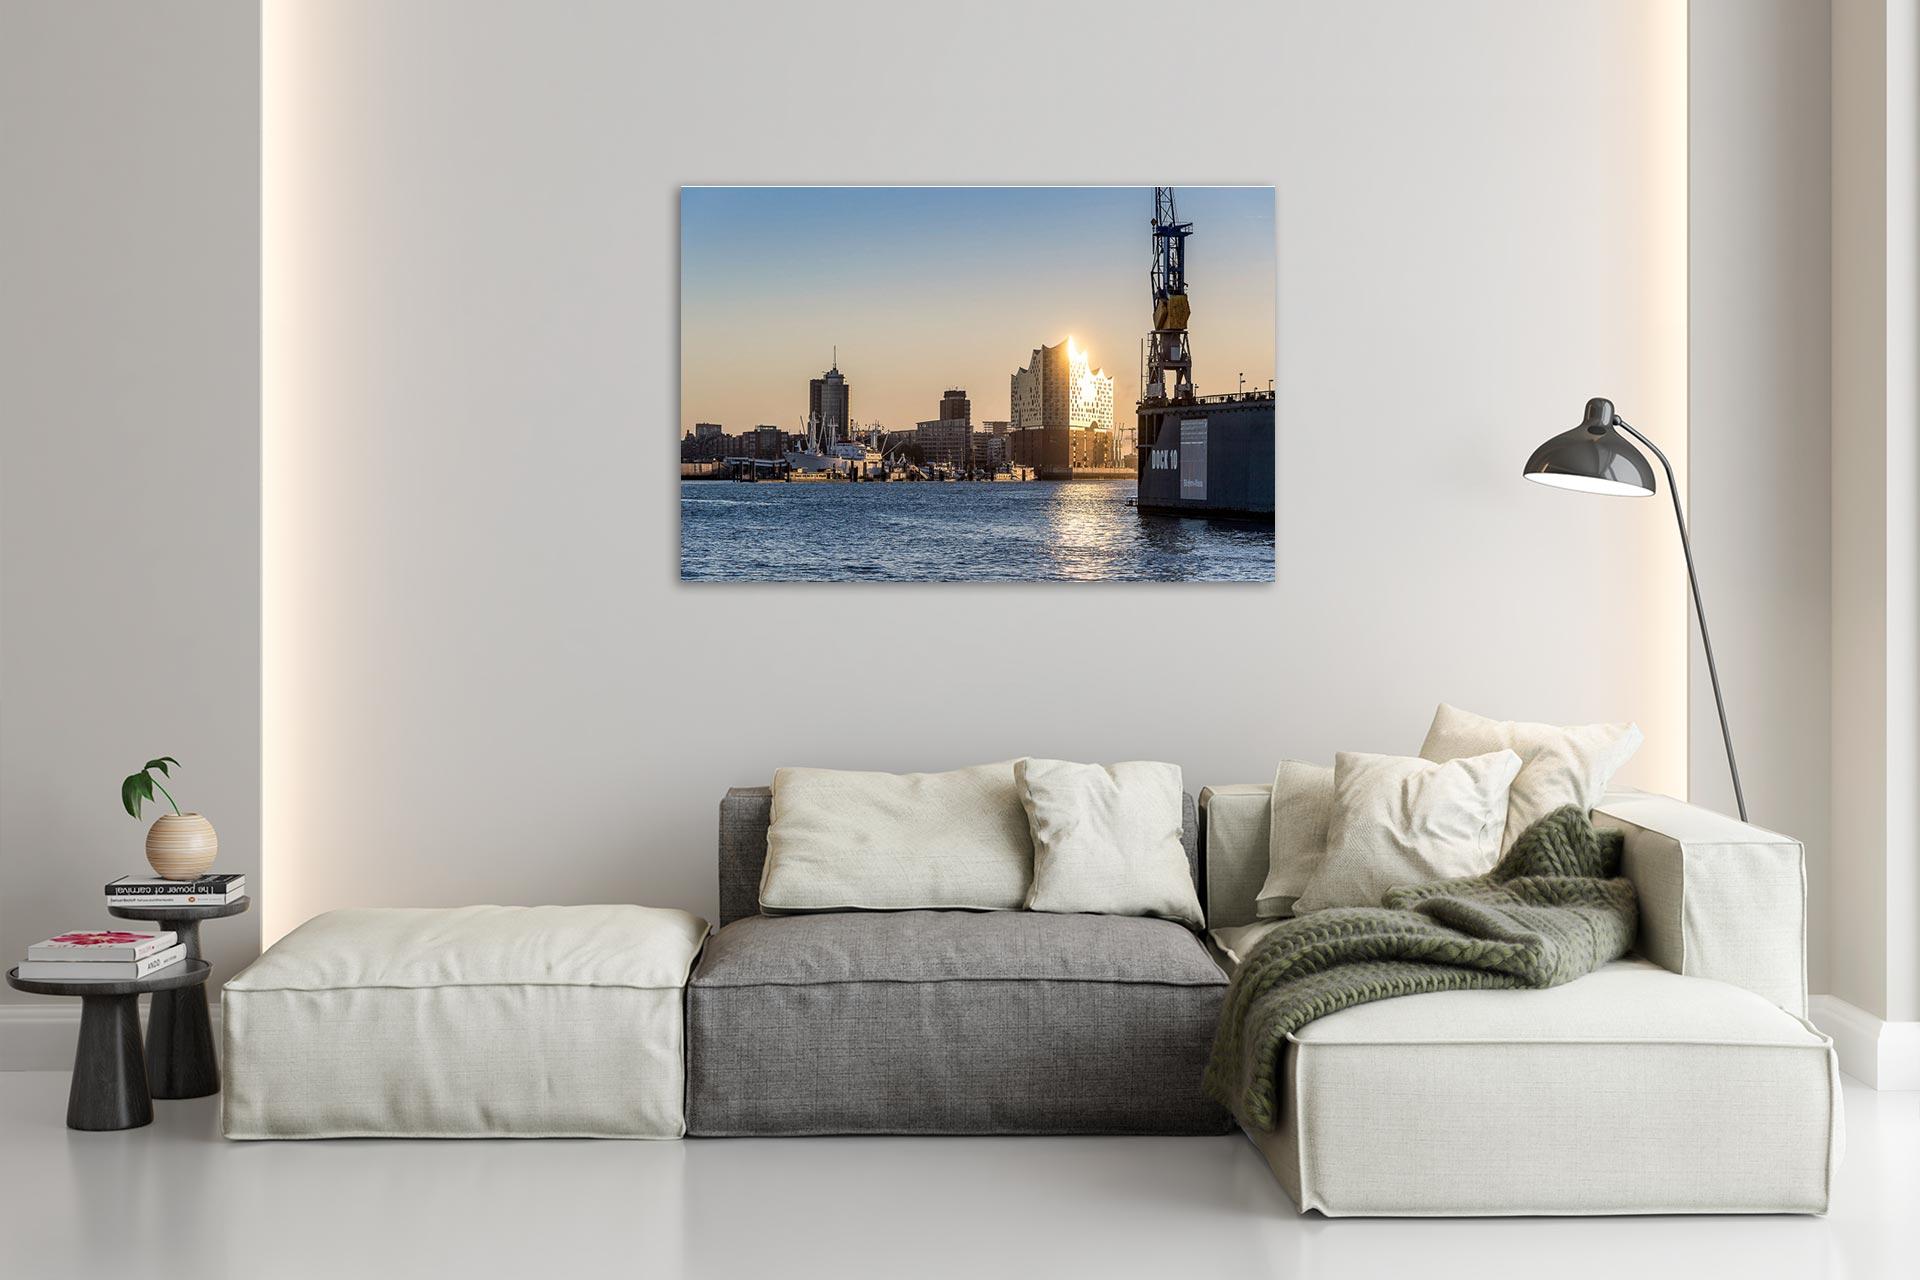 LCW280-glow-wandbild-bild-auf-leinwand-acrylglas-aludibond-wohnzimmer